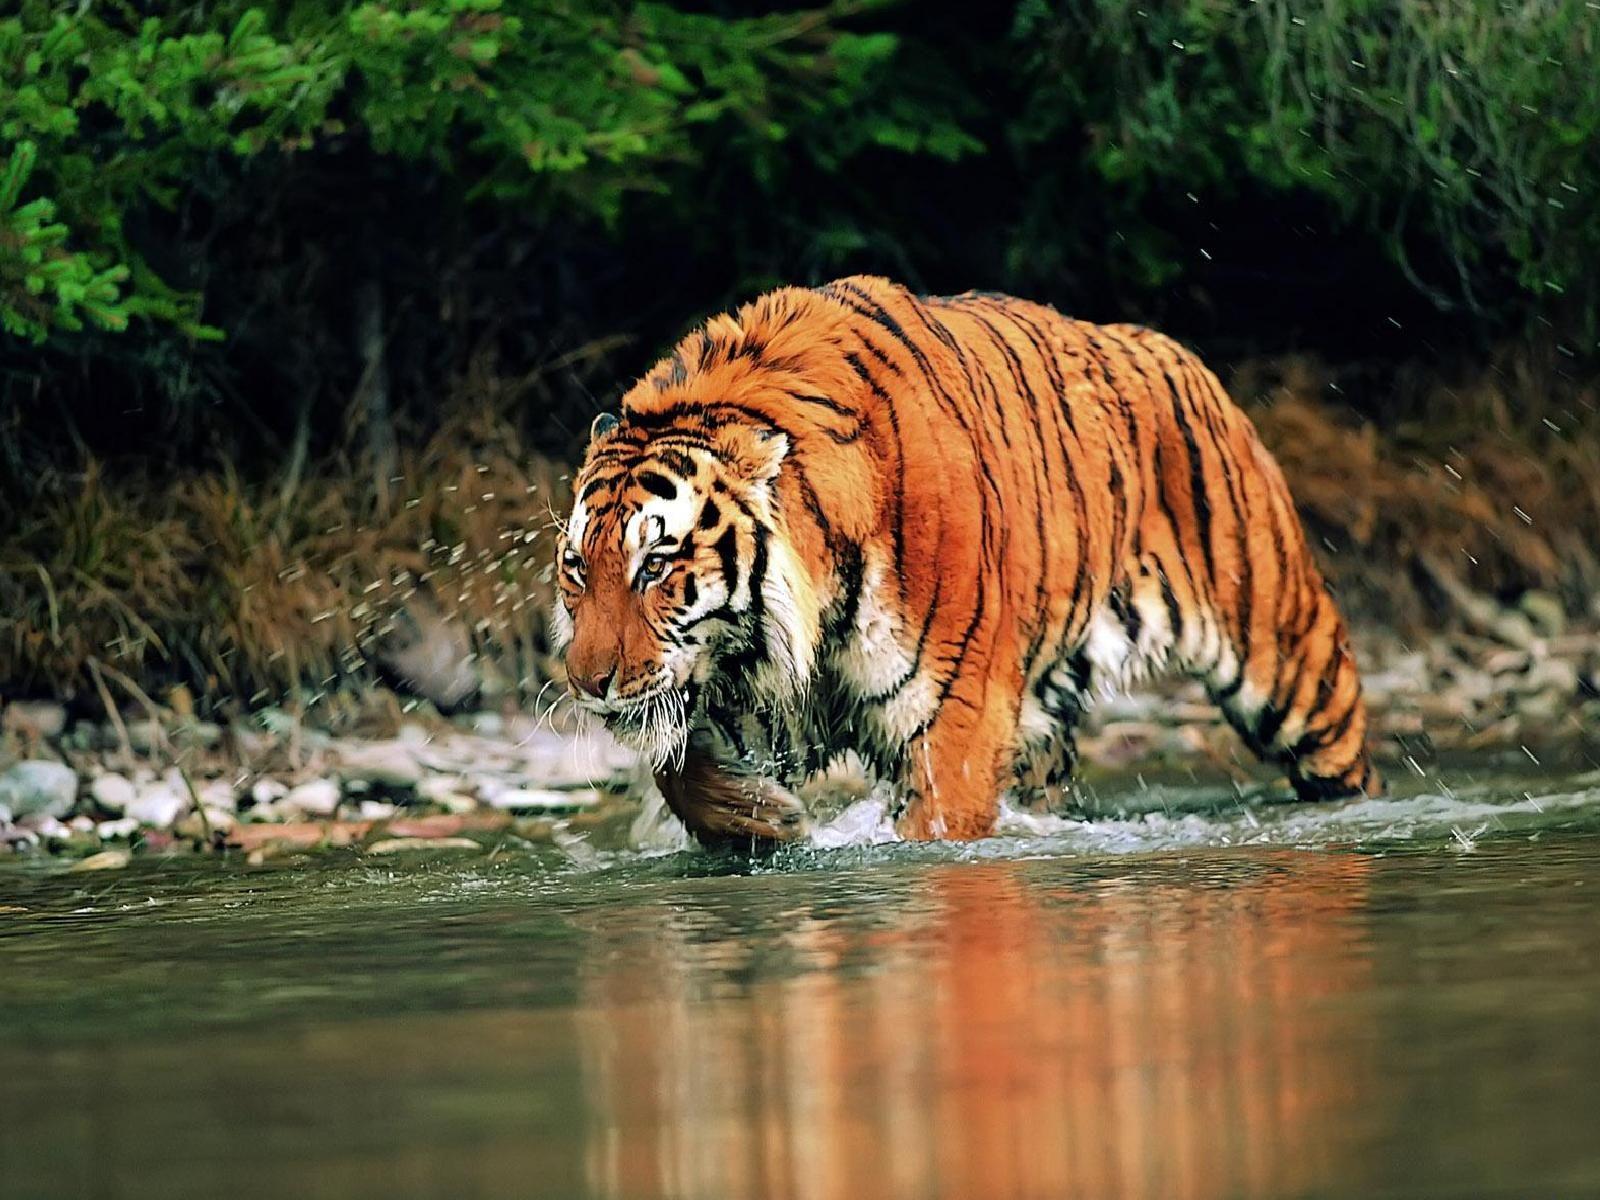 Siberian Tiger Apple Windows Wallpaper Wallpaper Tiger 920 high 1600x1200